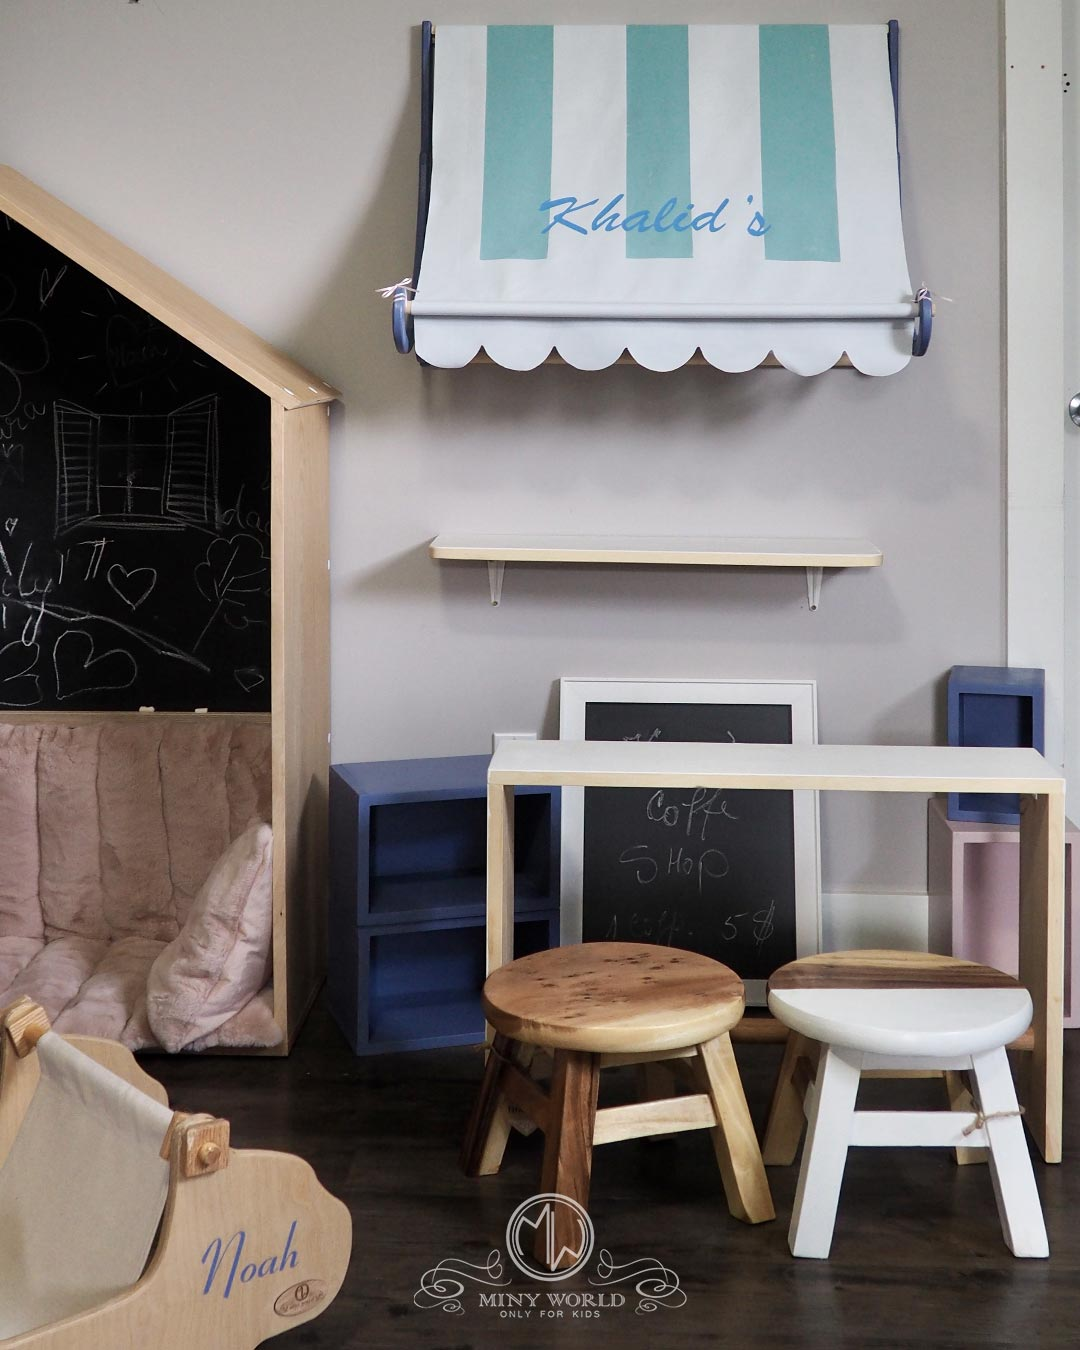 Noah_playroom_interior_design_minyworld_11